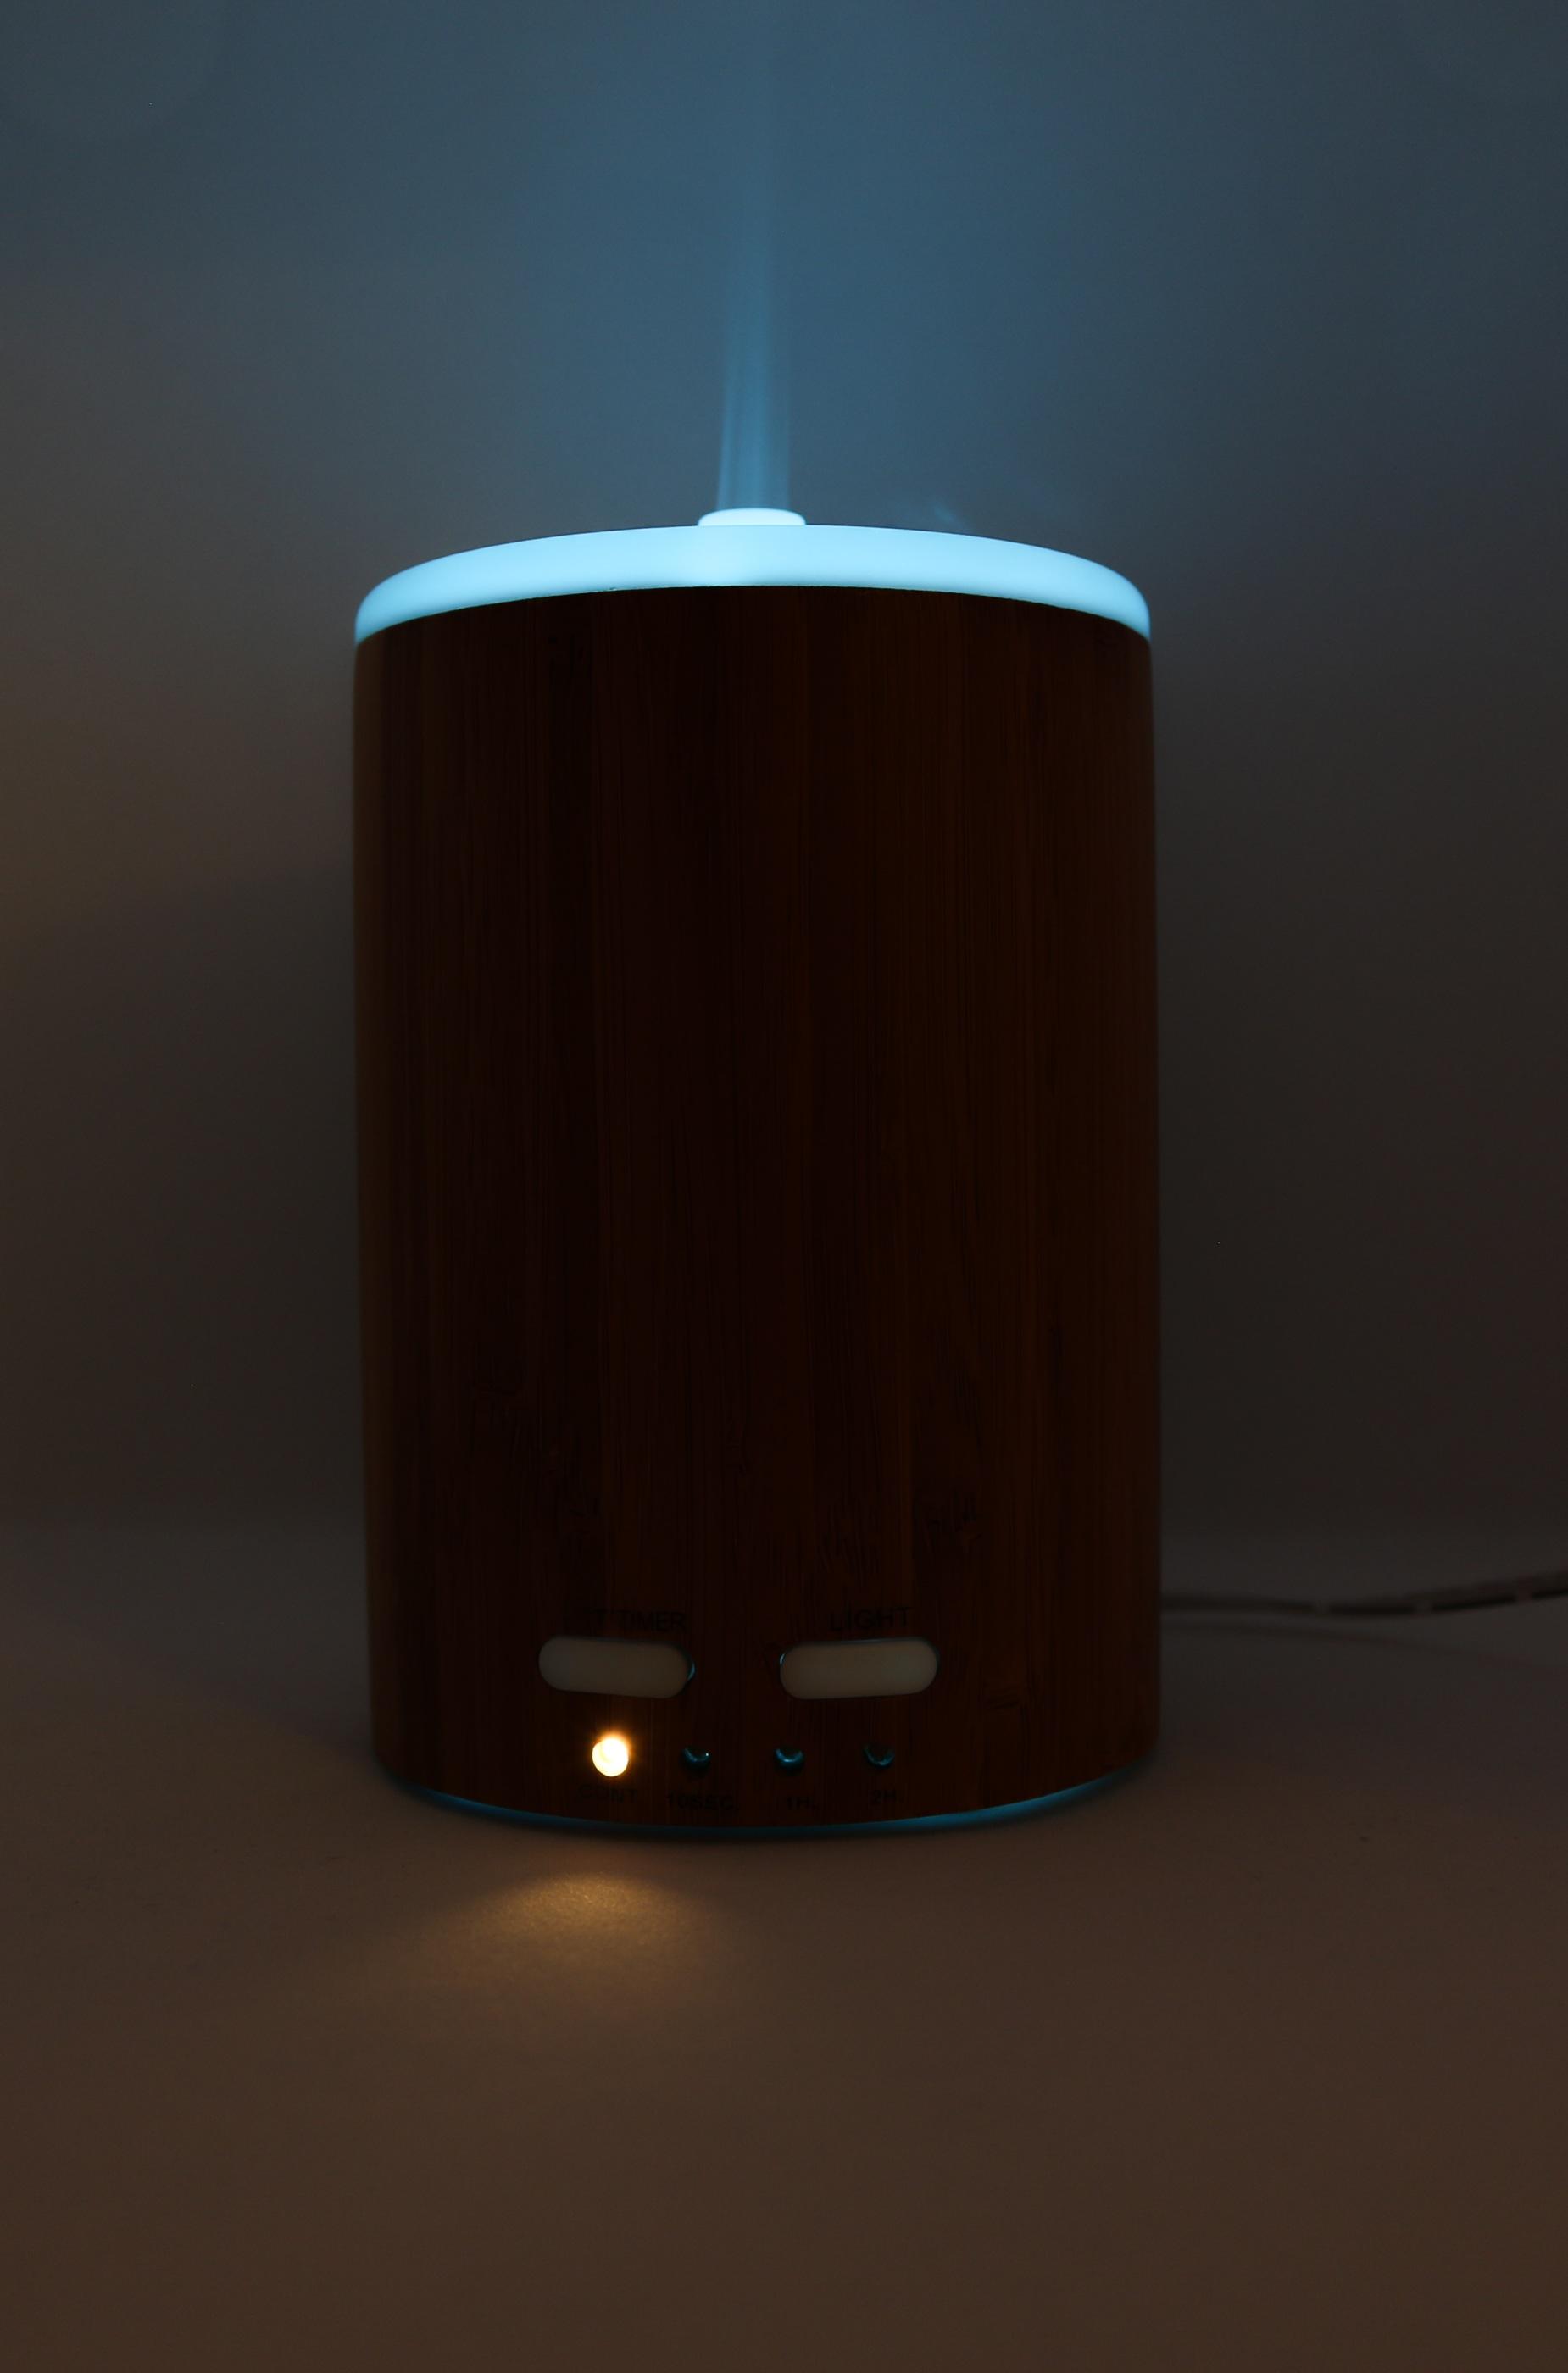 Aroma Diffuser Aromalampa i trä wellness ayurveda halmstad sweden svensk lampa